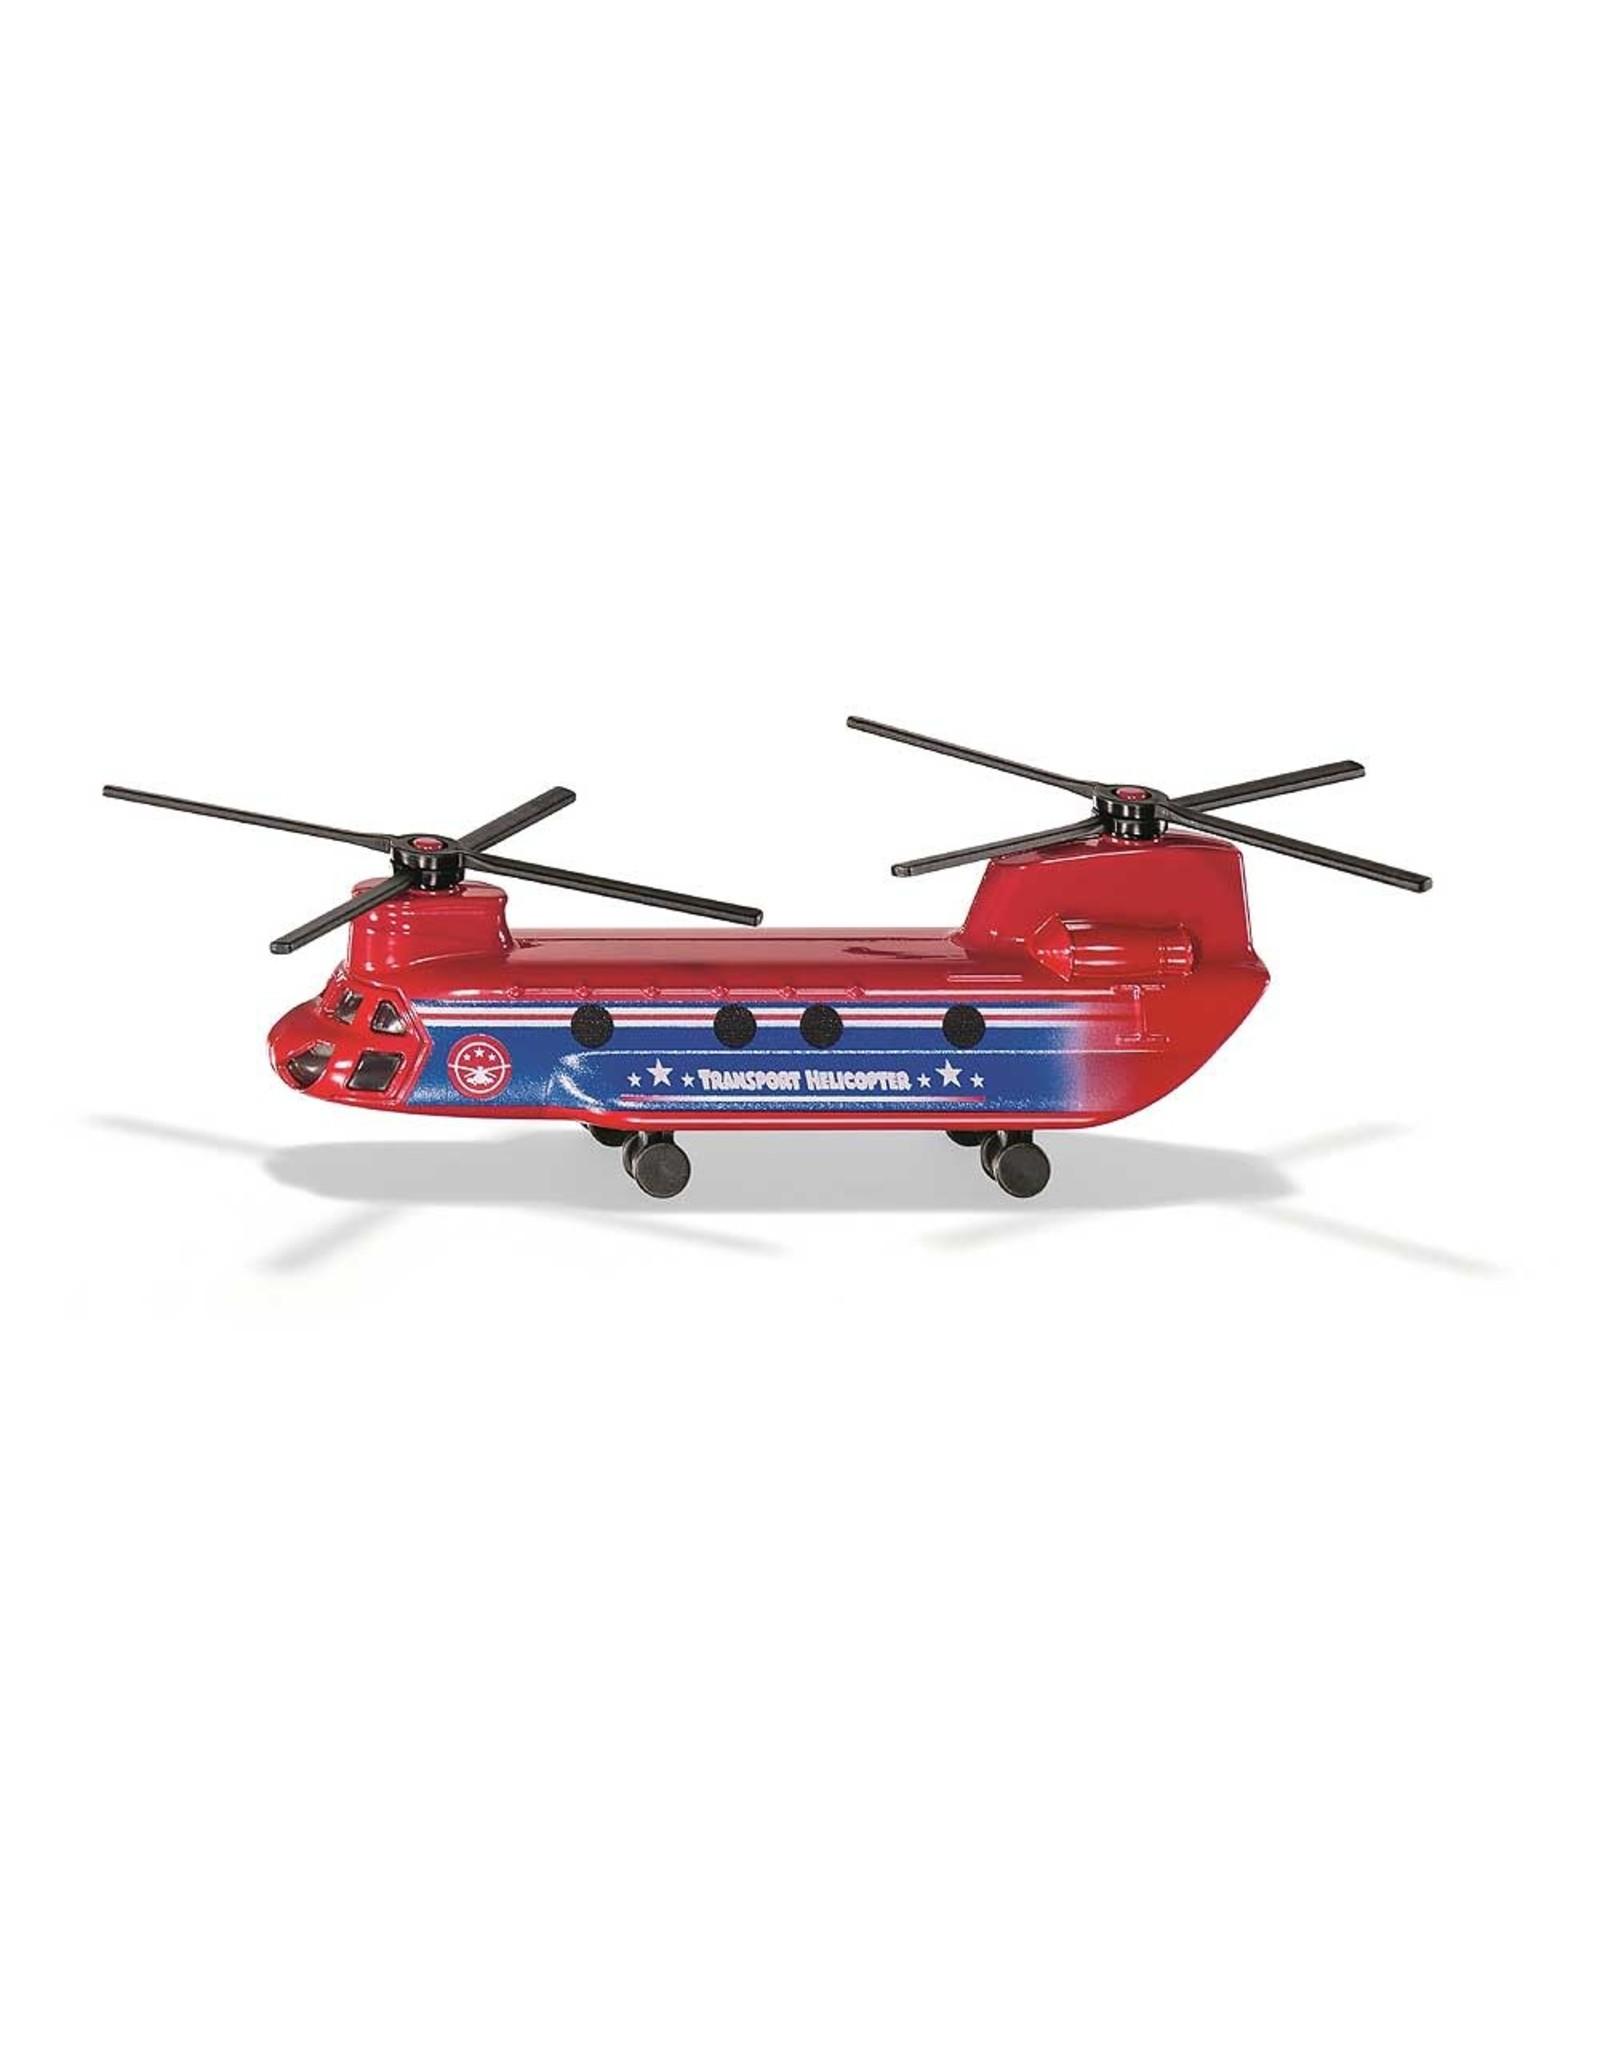 Siku Siku 1689 - Transporthelicopter